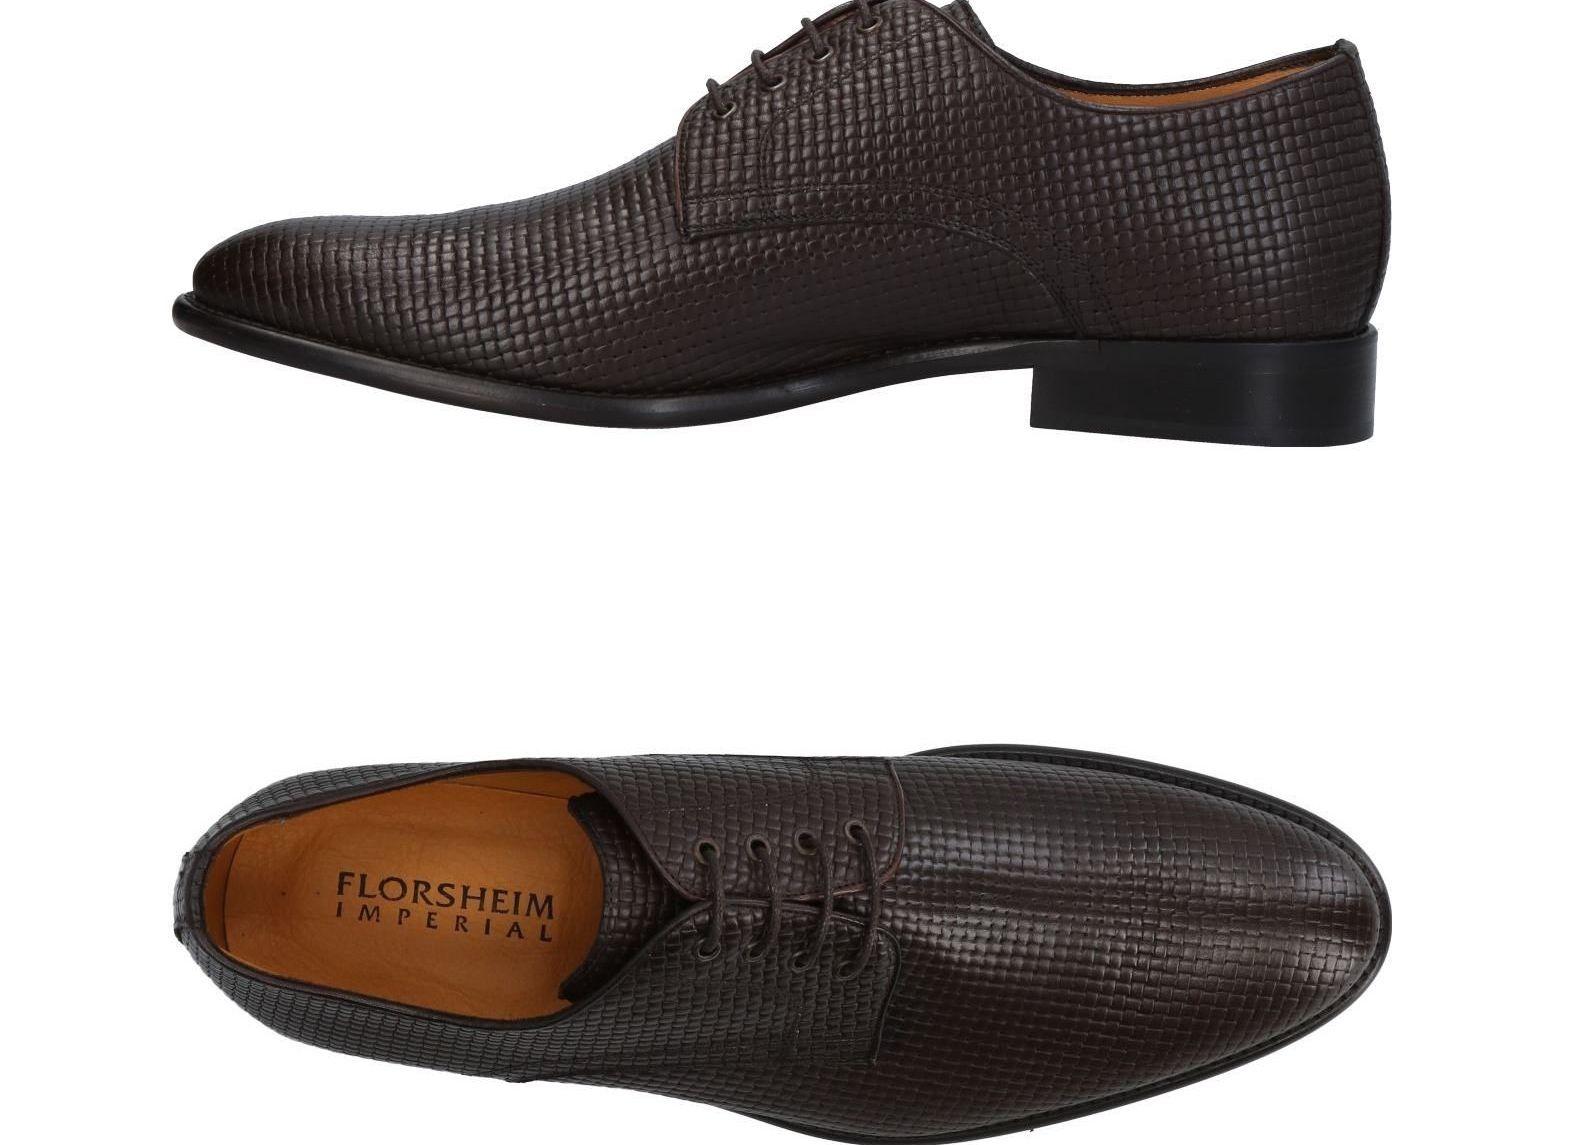 FLORSHEIM IMPERIAL ΠΑΠΟΥΤΣΙΑ Παπούτσια με κορδόνια